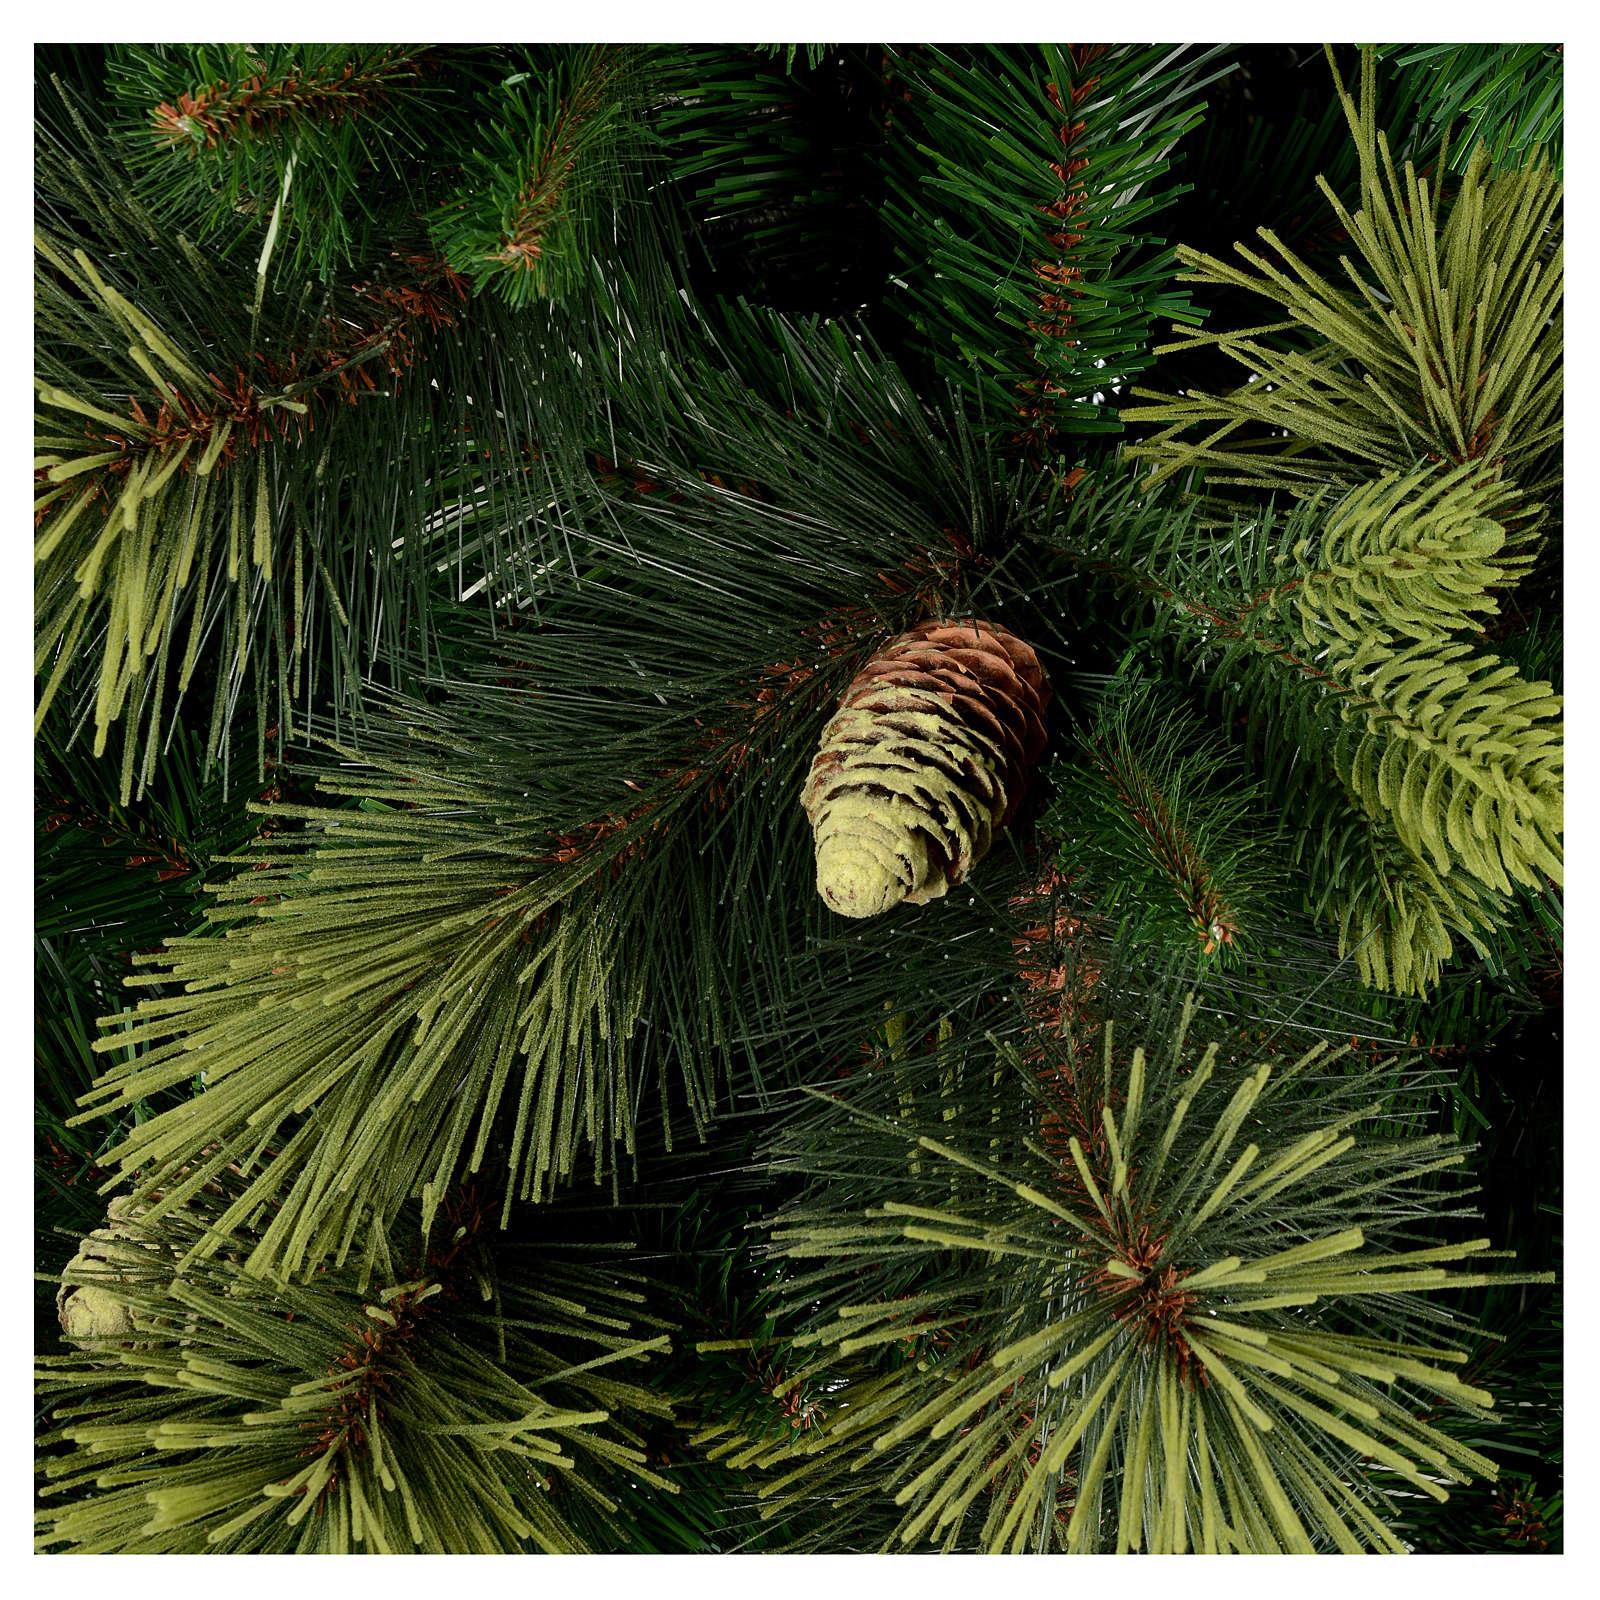 Sapin de Noël 225 cm couleur vert avec pommes de pin Carolina 3